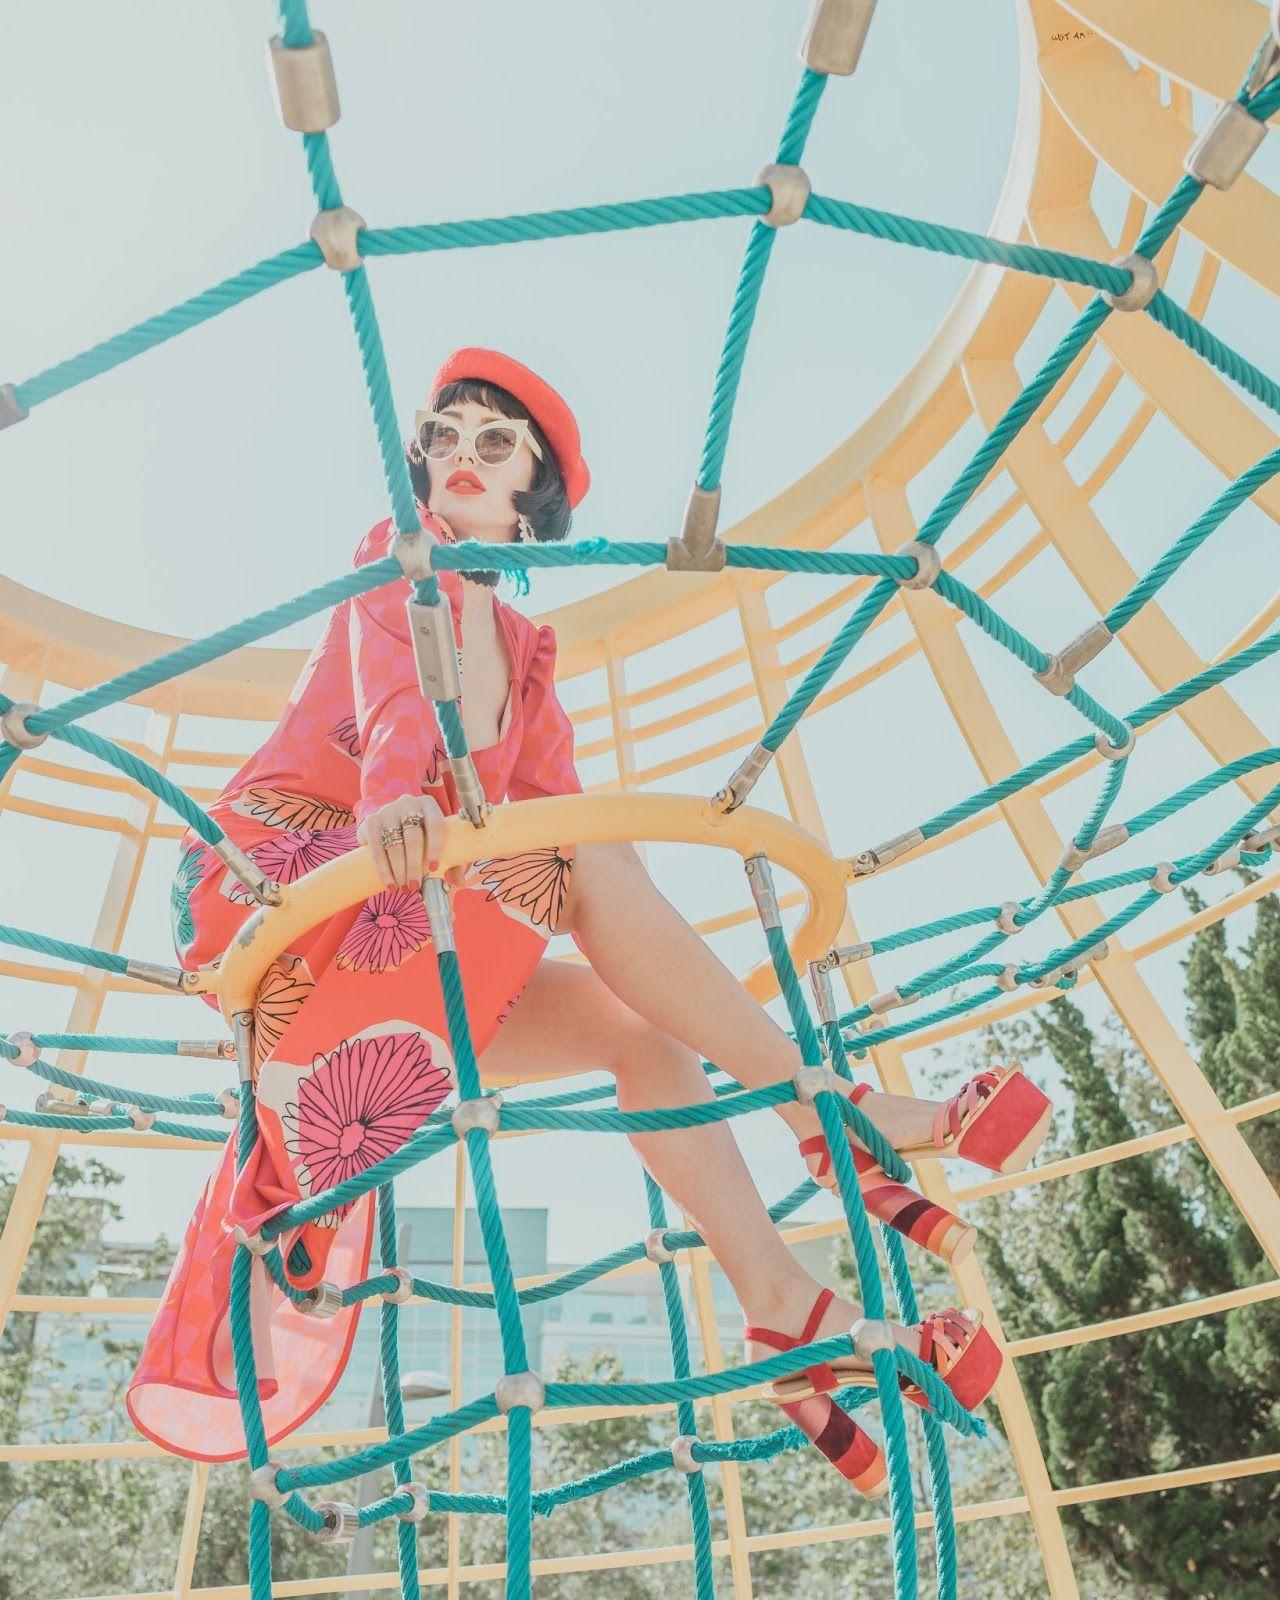 Playground Photoshoot Aesthetic